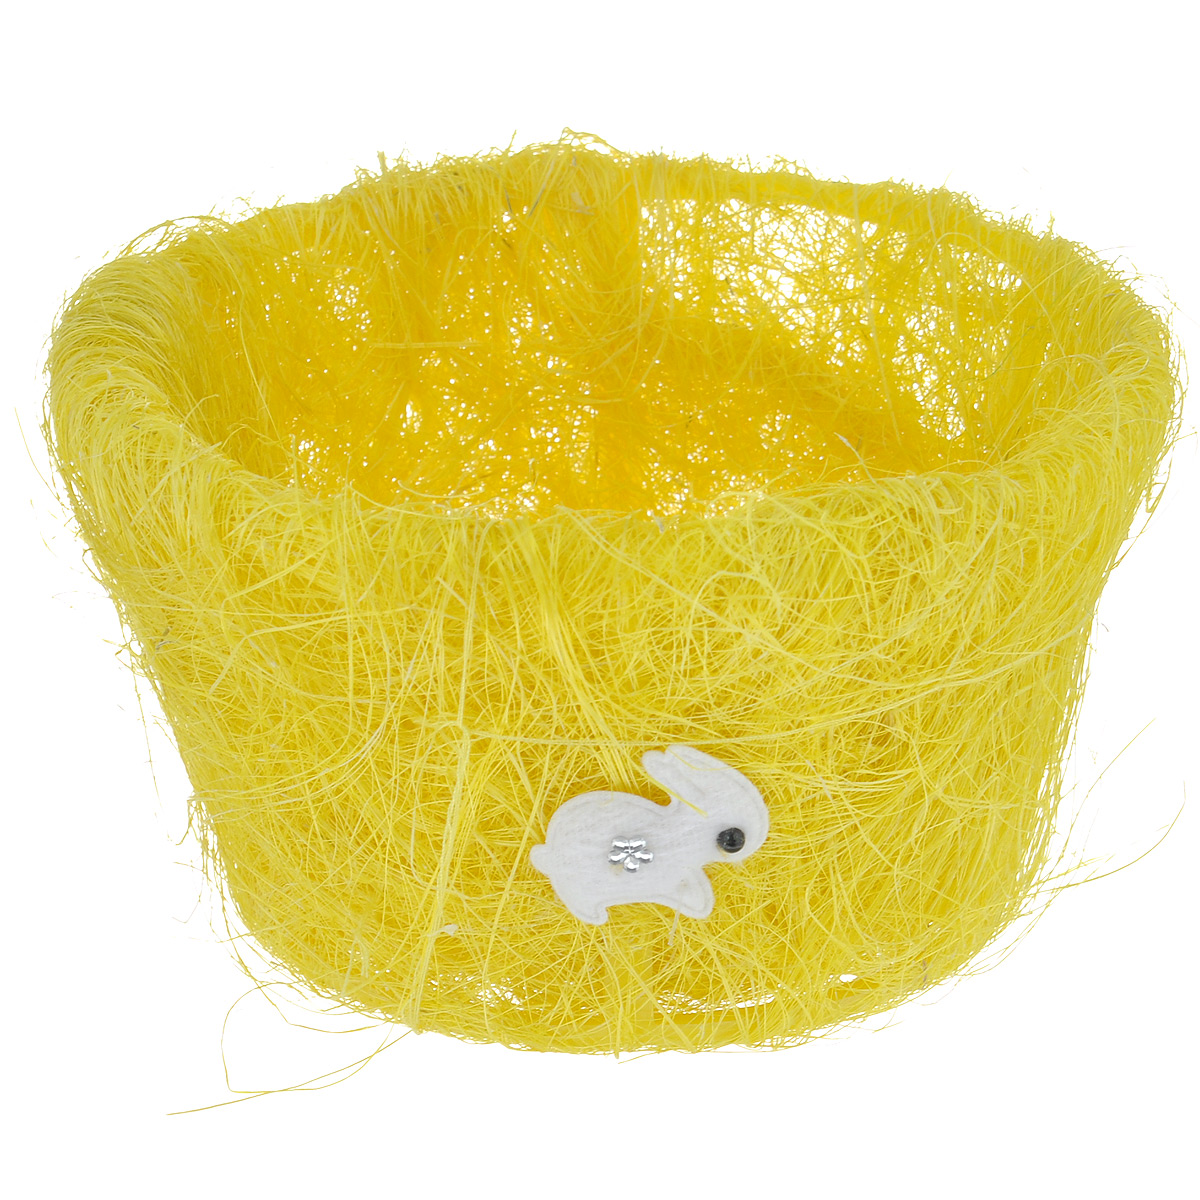 Корзина декоративная Home Queen Полевые цветы, цвет: желтый, 15,5 х 9 см корзина декоративная home queen ромашки цвет желтый 16 х 16 х 8 см